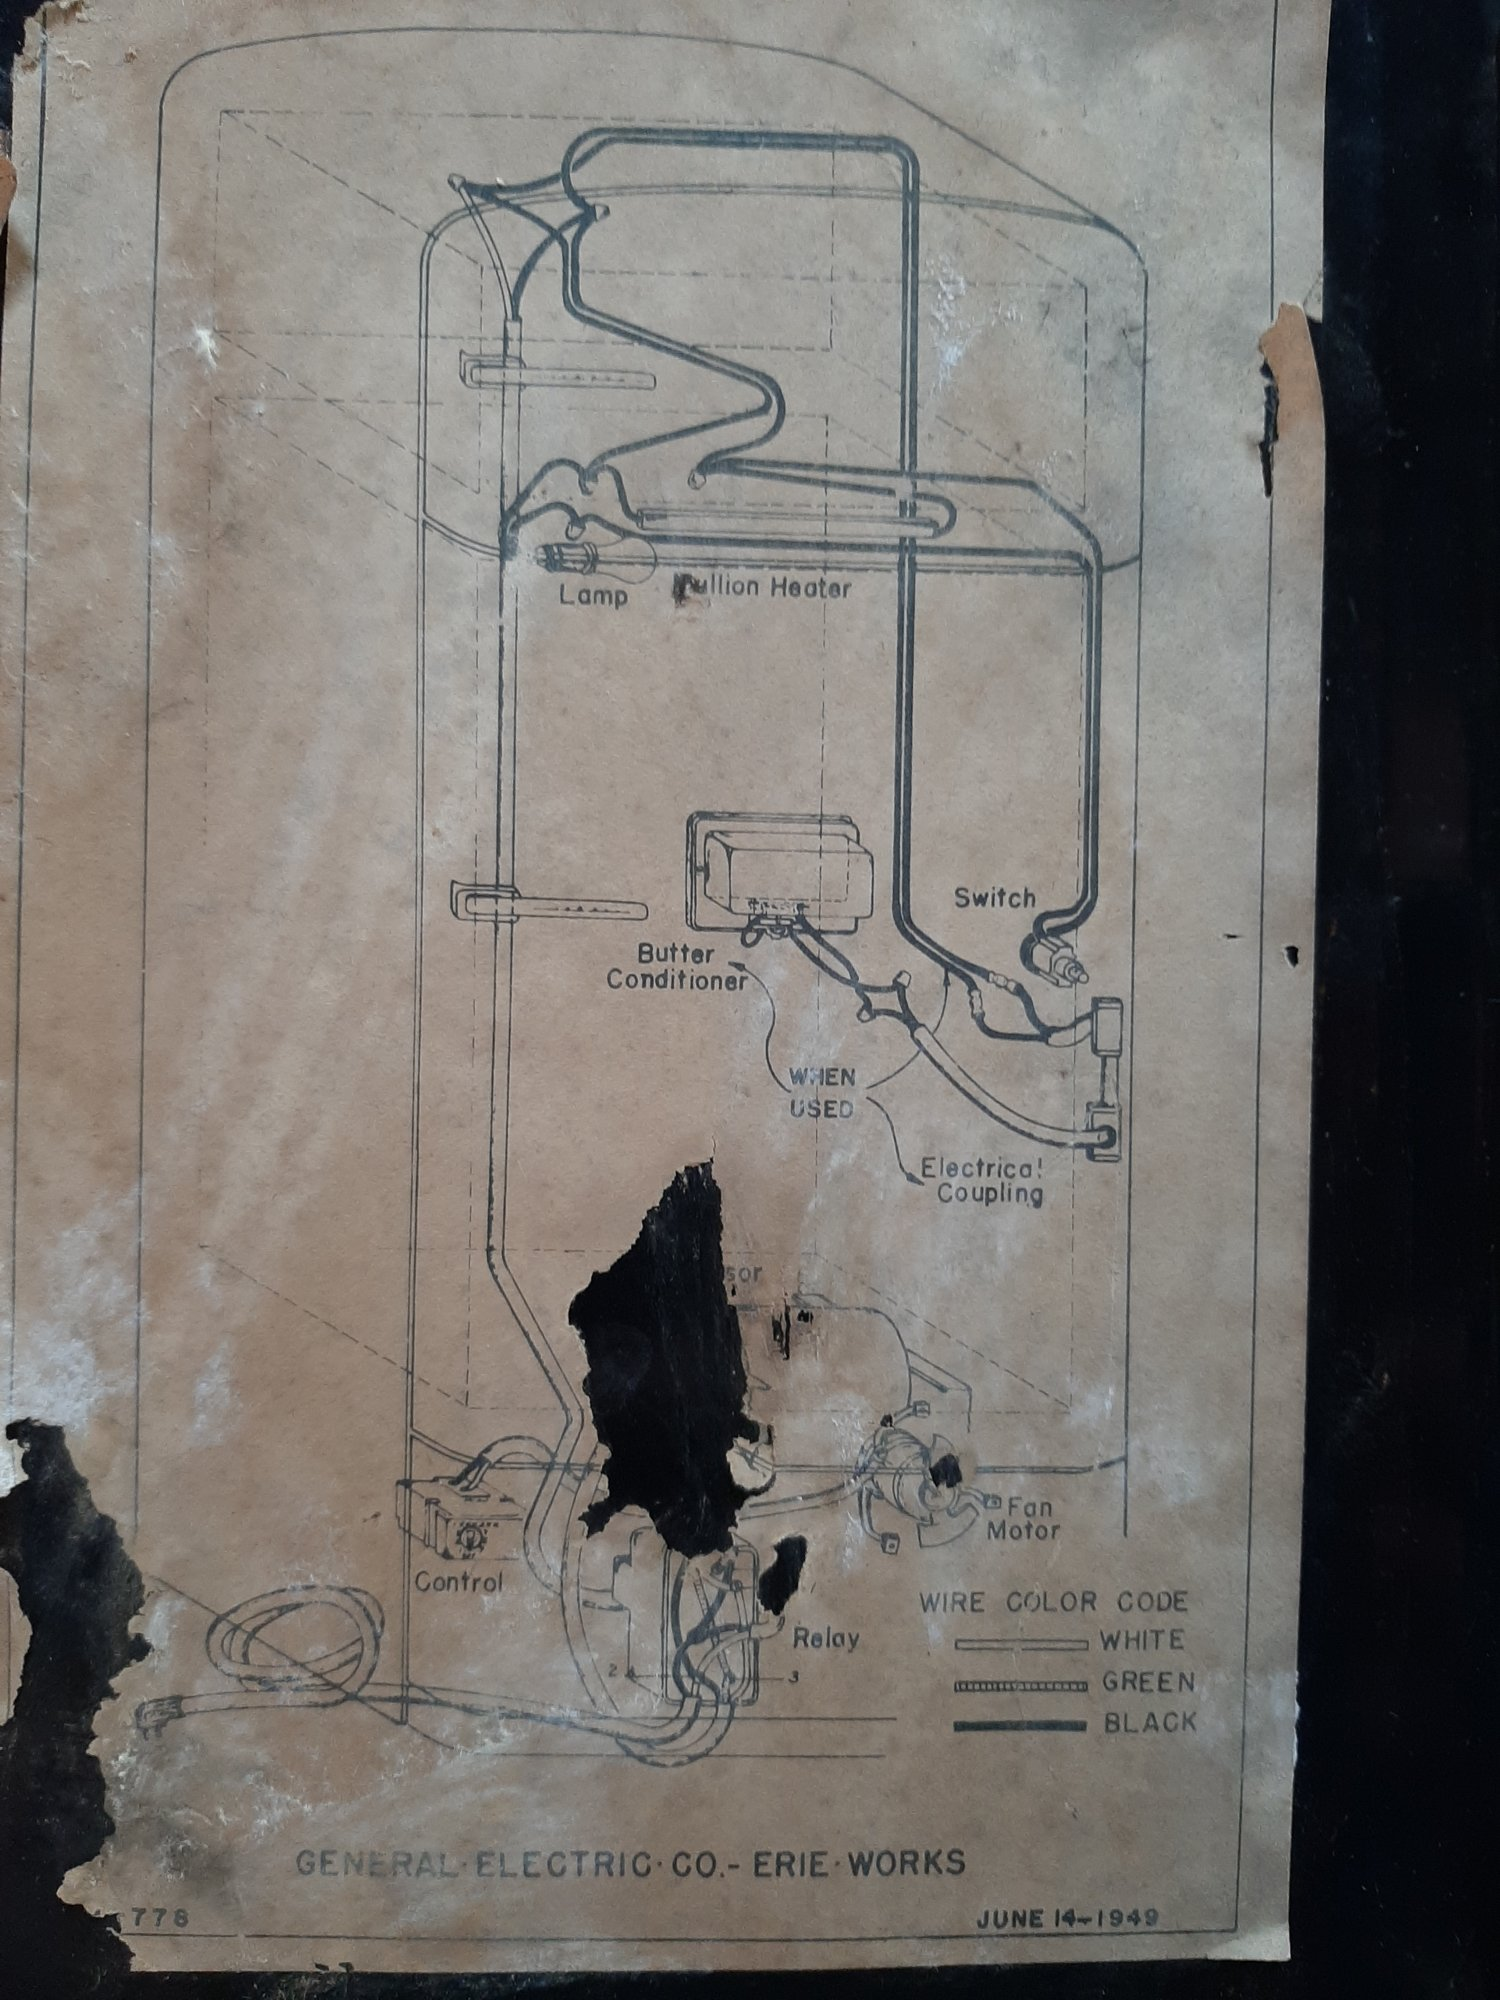 1950 GE combination fridge wiring problem - Model NH-10-GC | Applianceblog  Repair Forums | Ge Refrigerator Wiring Diagram Problem |  | ApplianceBlog